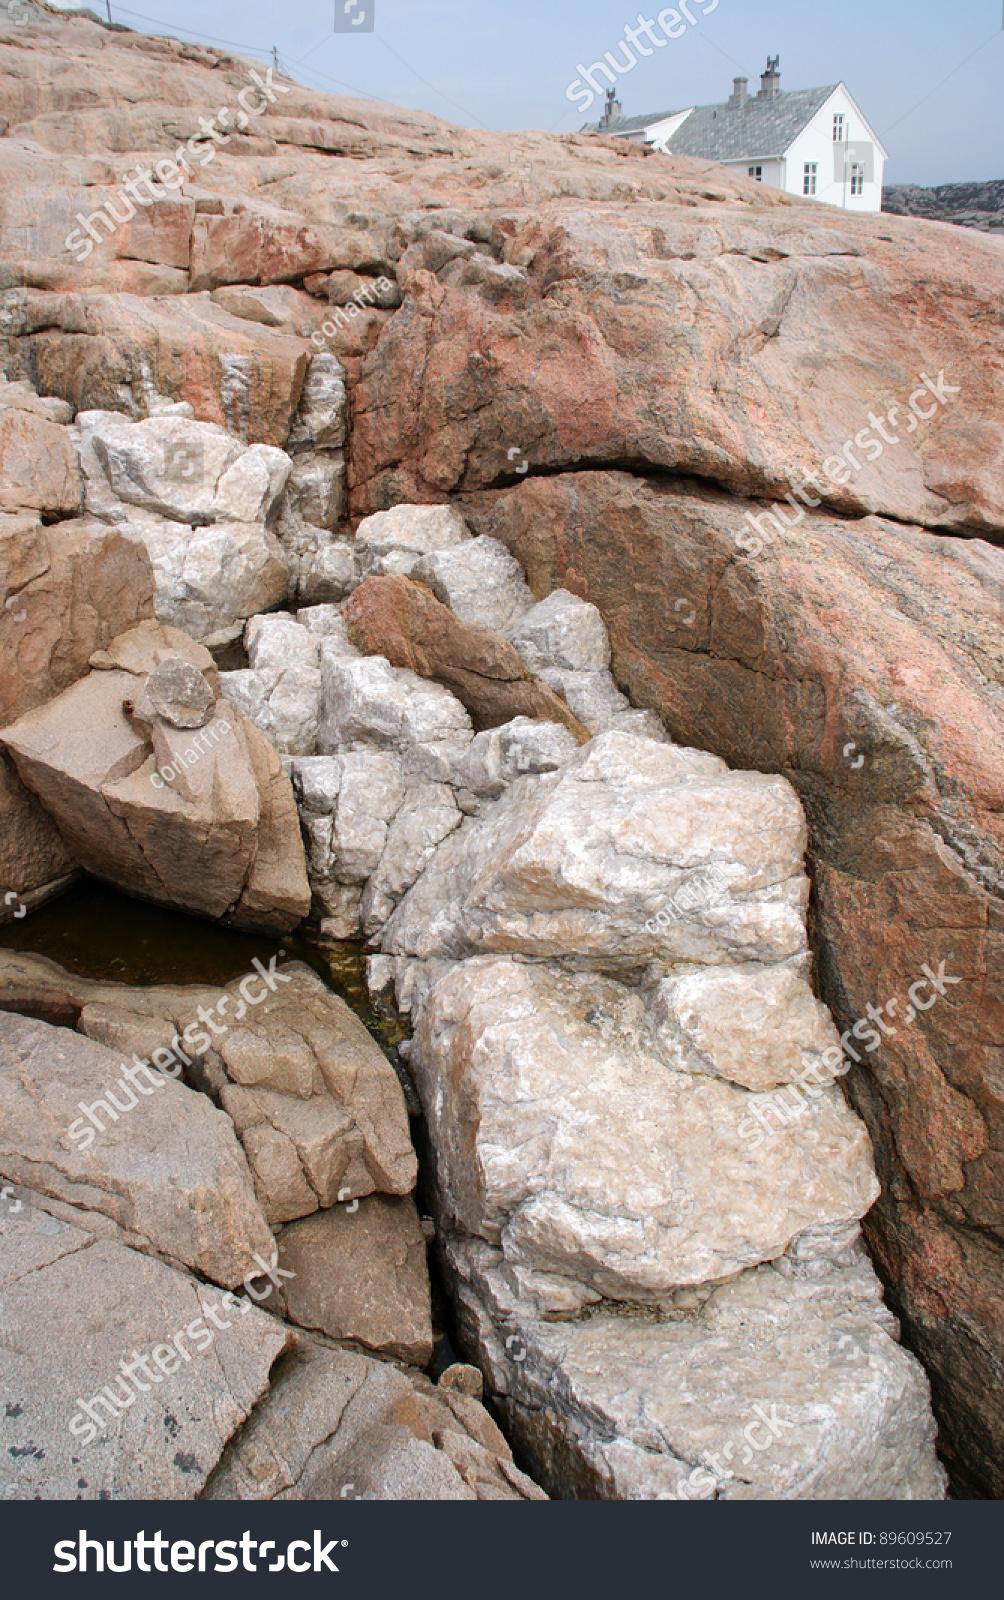 Red Granite Rock : A quartz intrusion in fractured red granite rocks